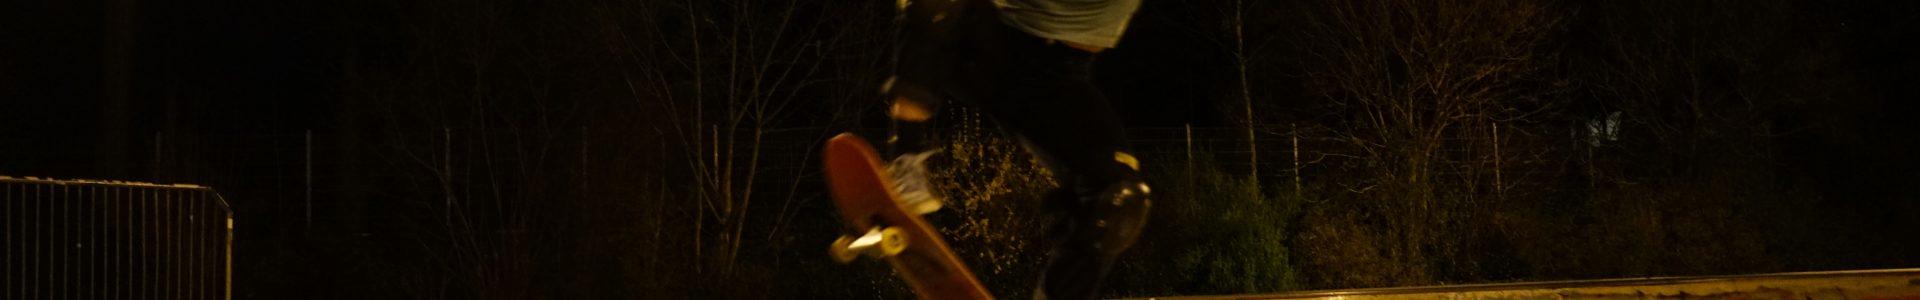 Drop Out - Girlsday - Goodlands Skatepark Penzing